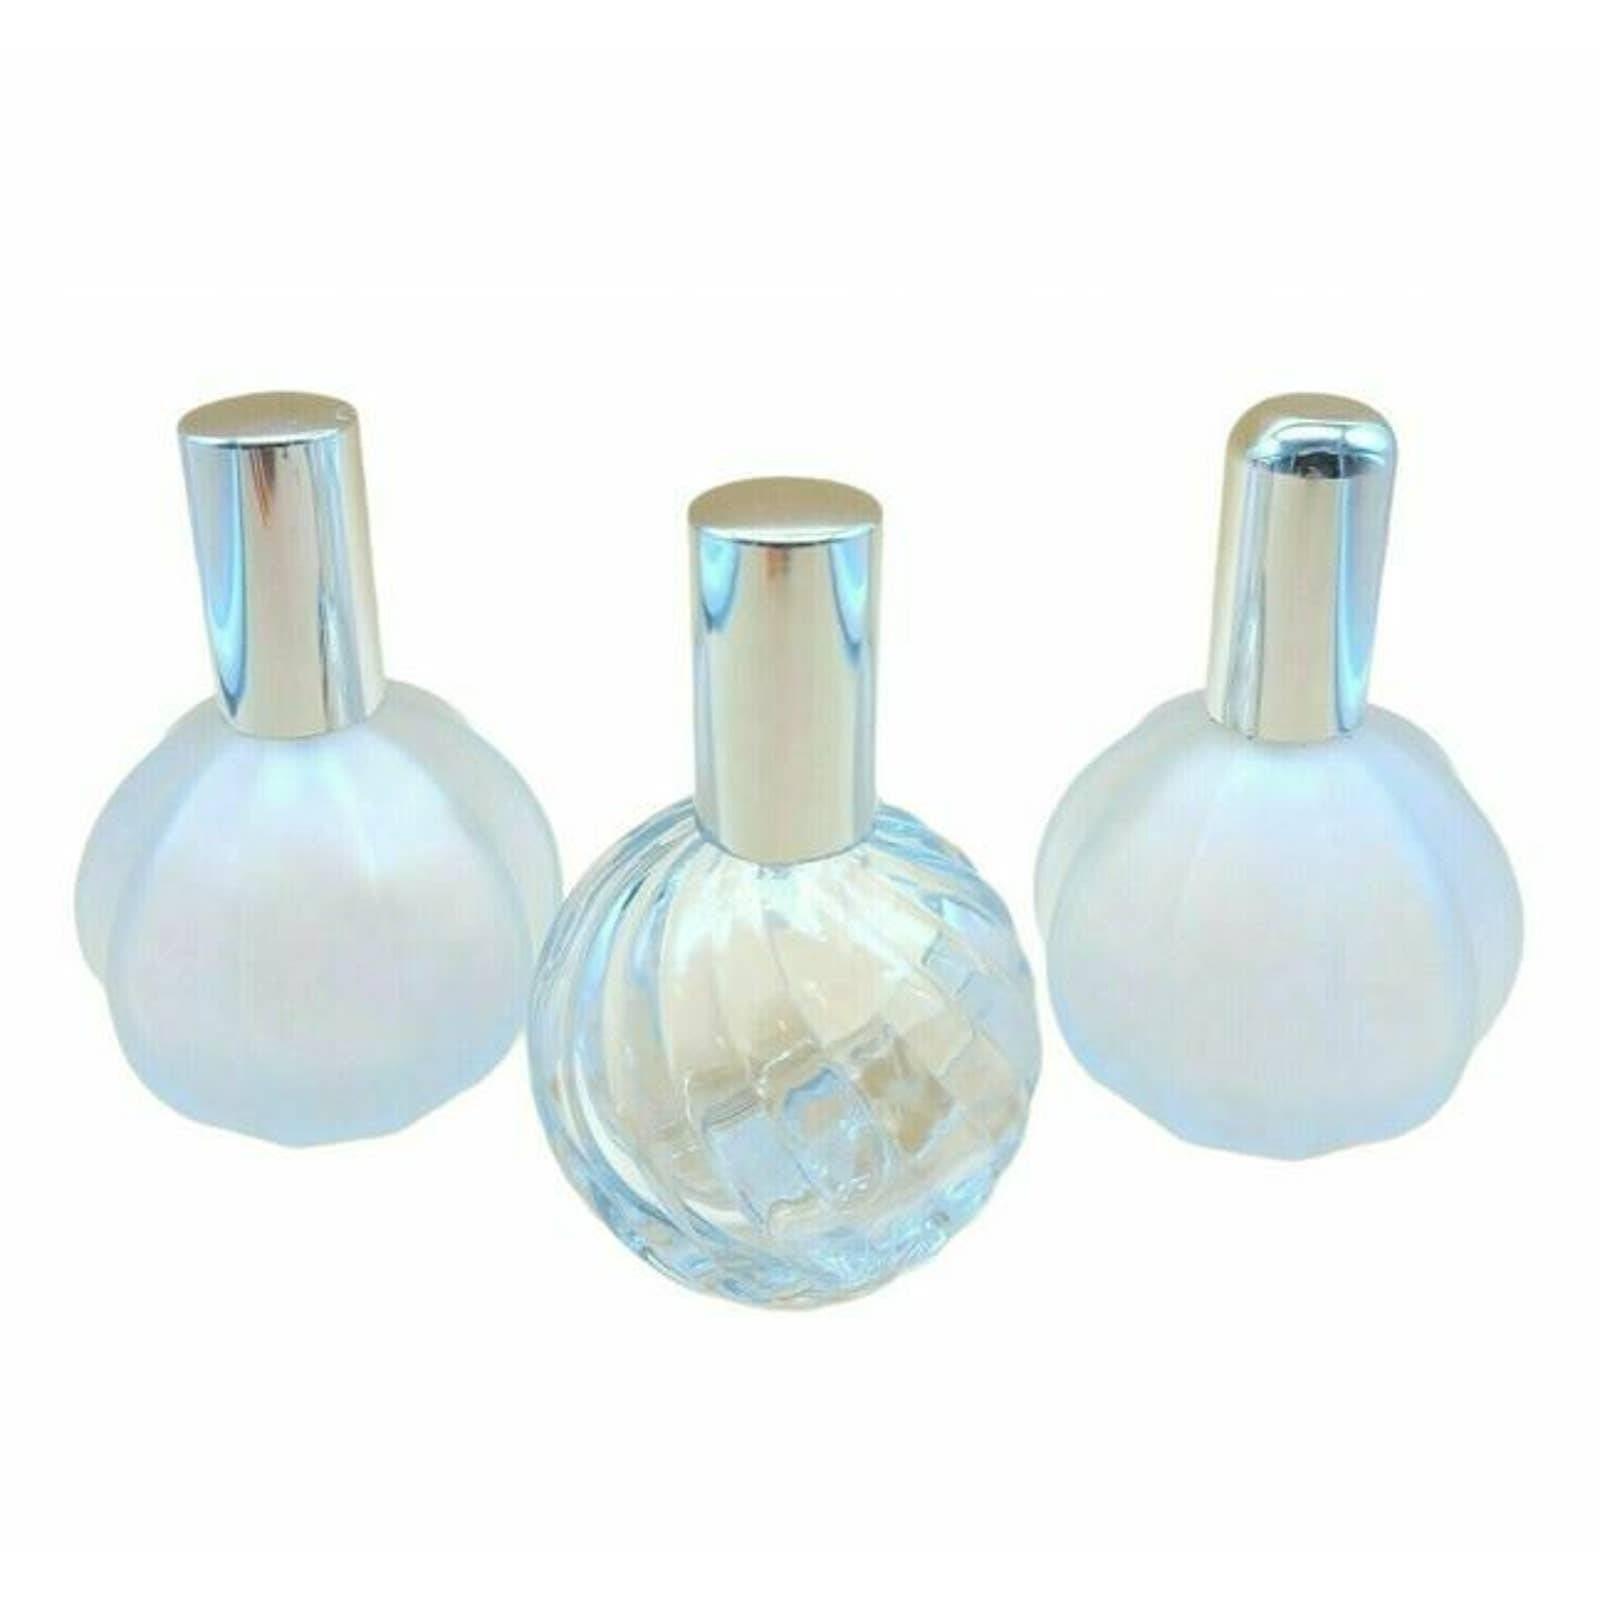 Glass Perfume Bottles Spritzers Austria